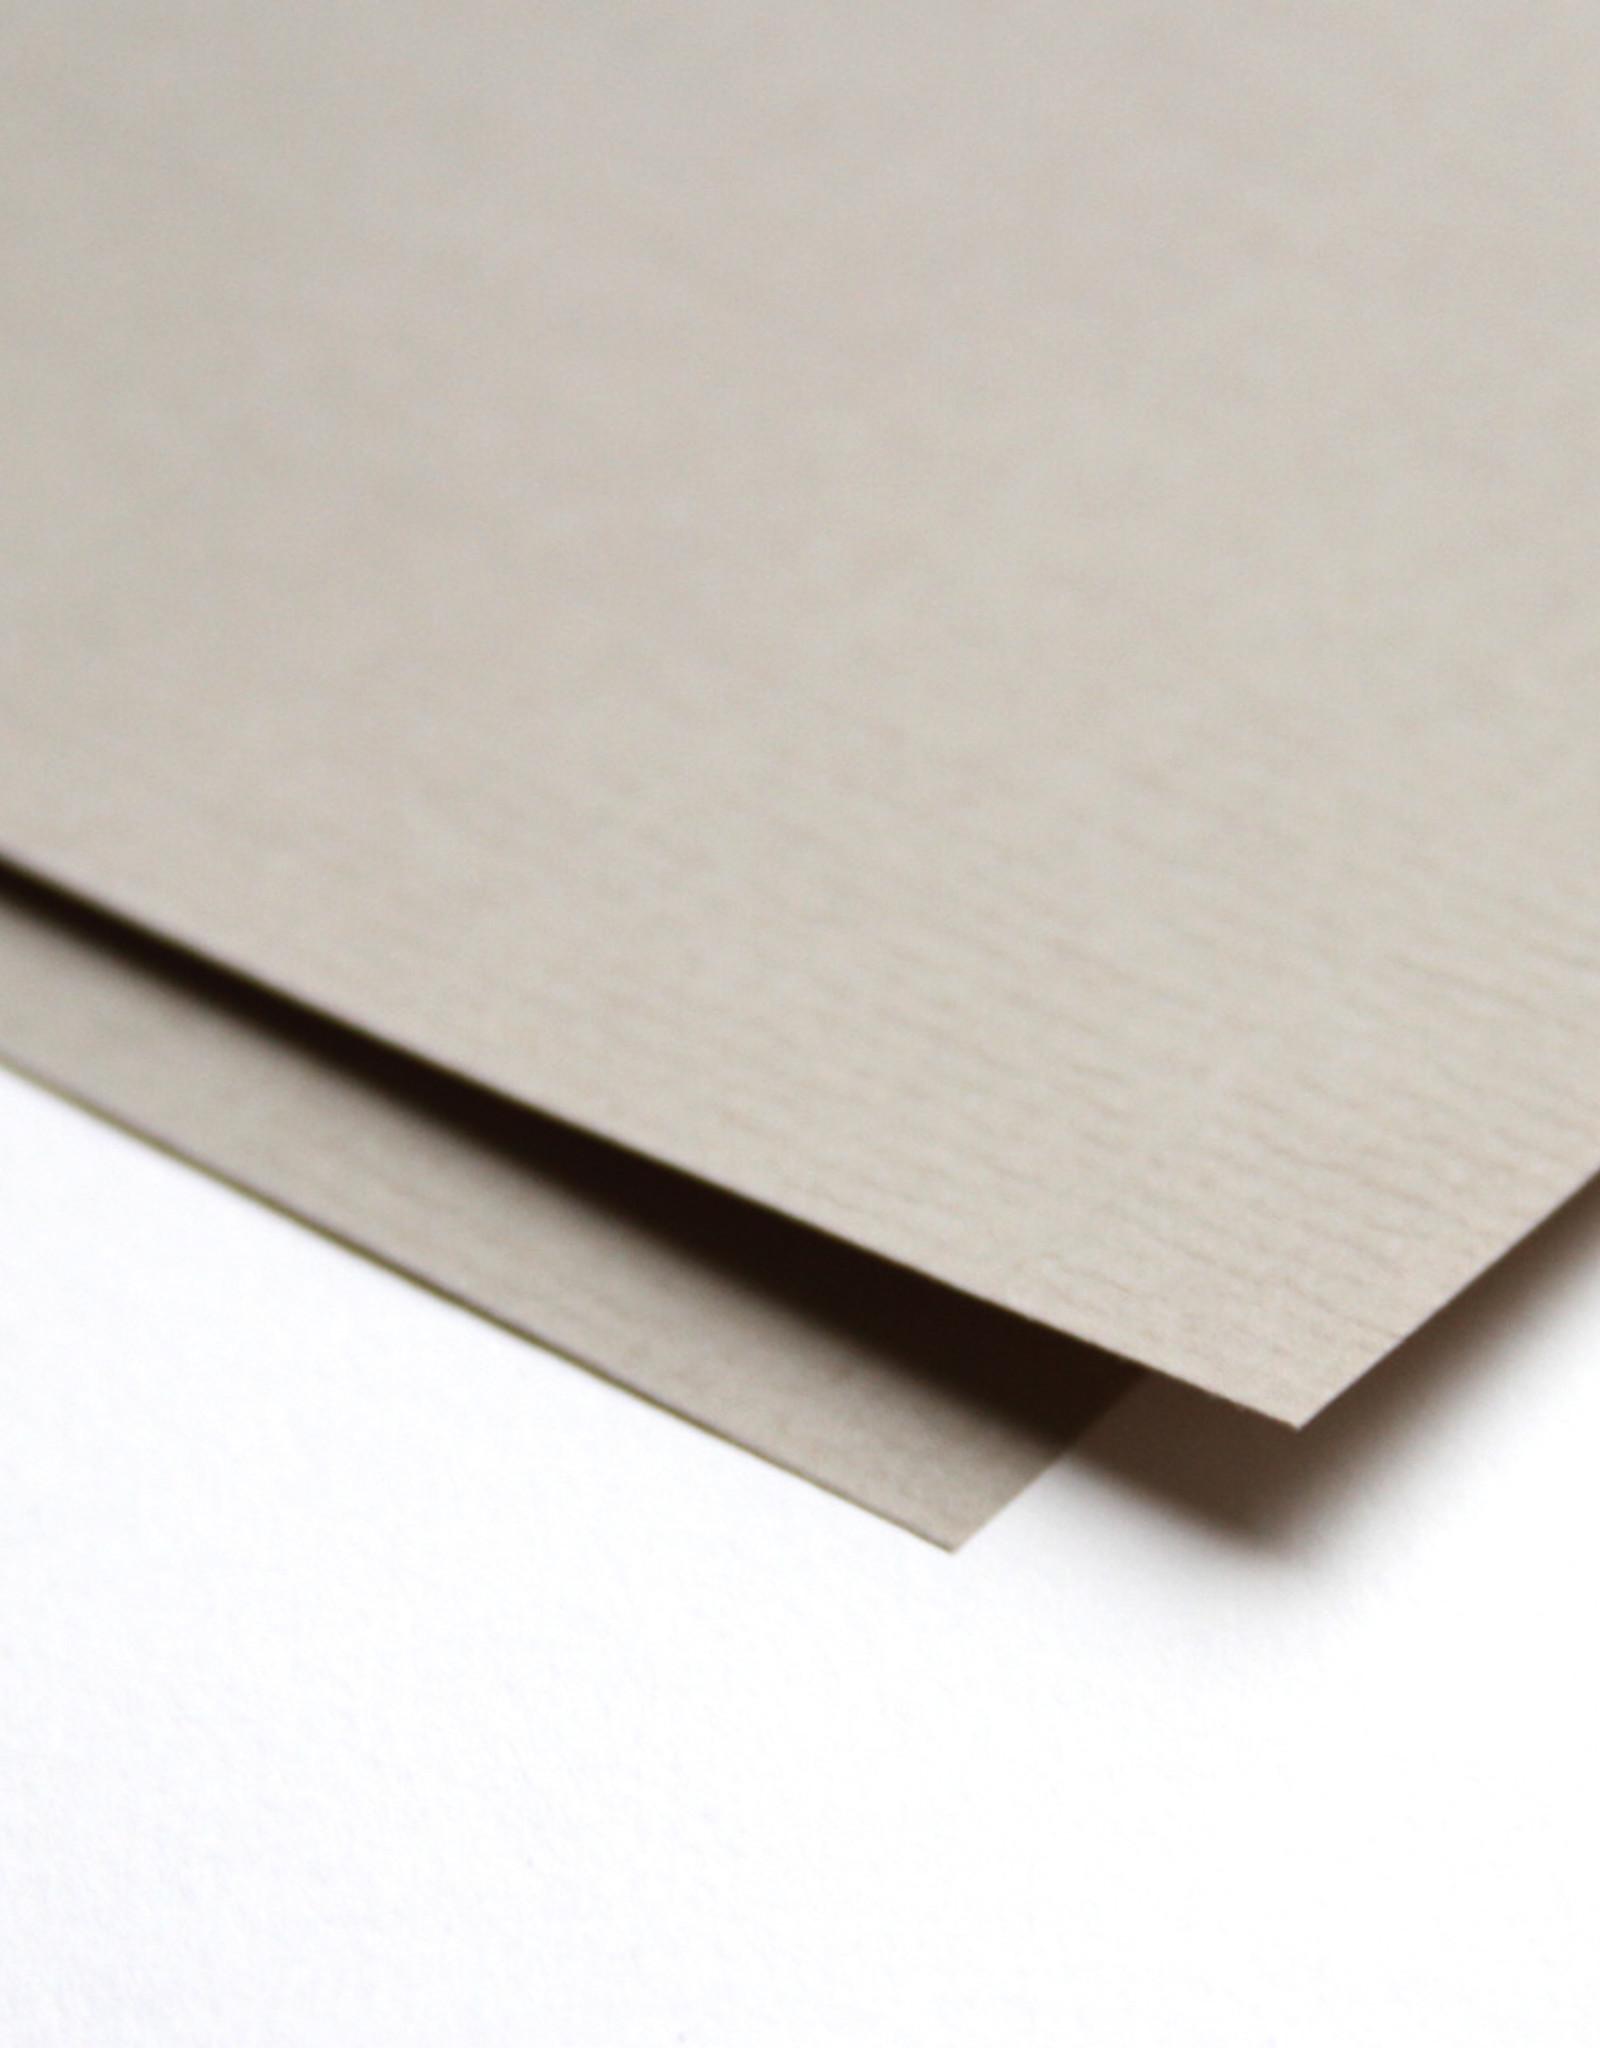 Fabriano 5 vel Ingres Papier 50 x 70 cm 160 grs Cenere Grijs Licht